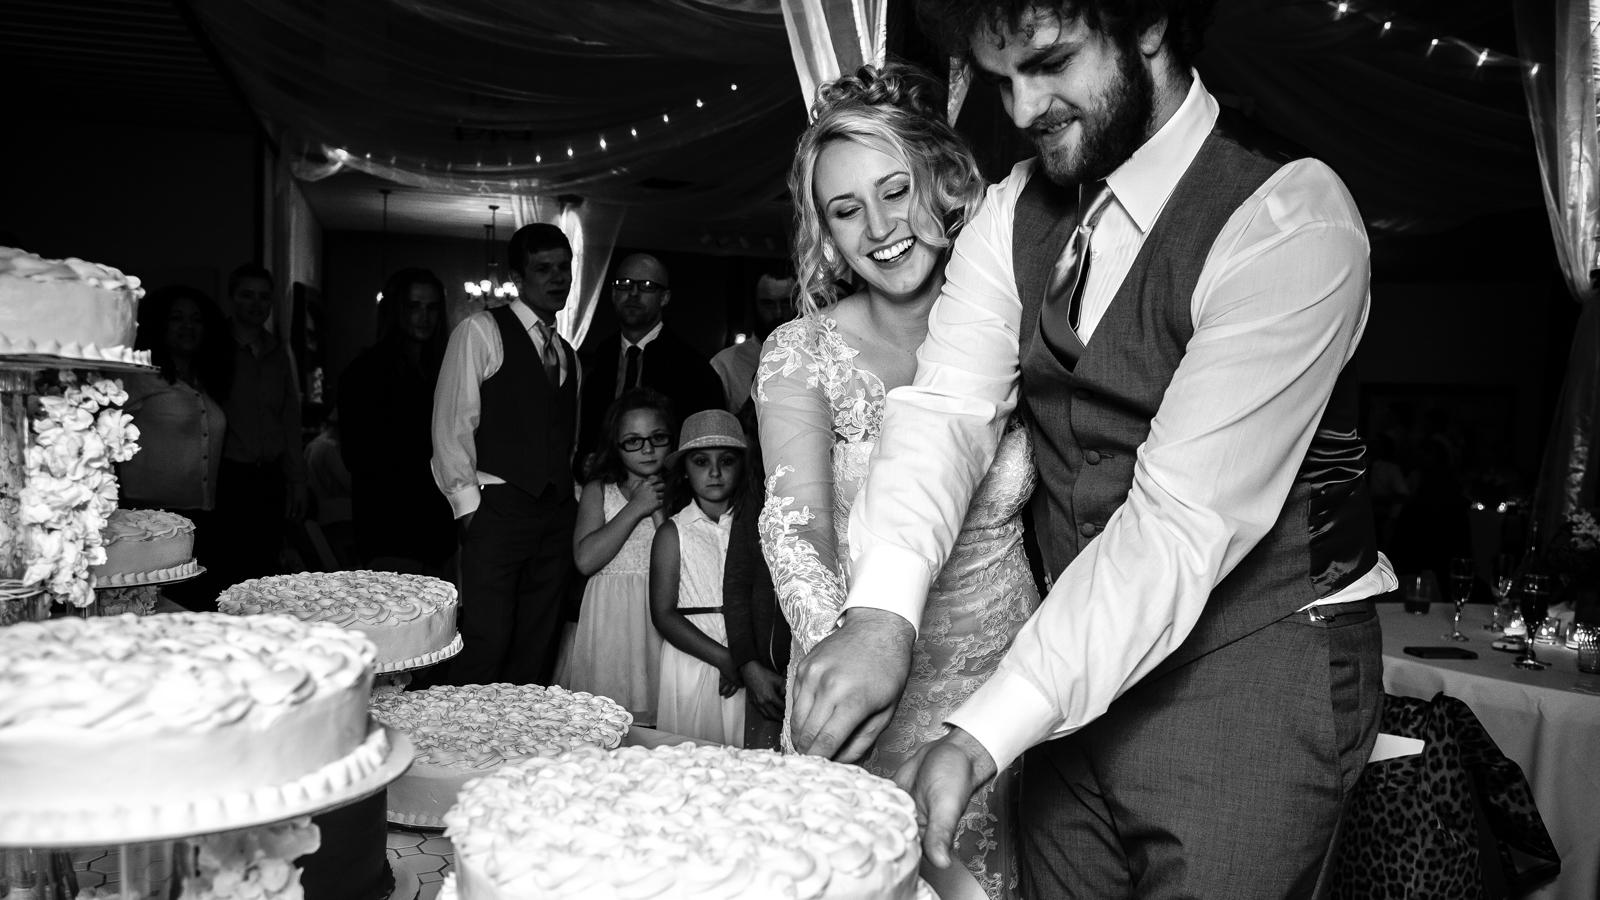 wedding cake / photography Braden Tenney